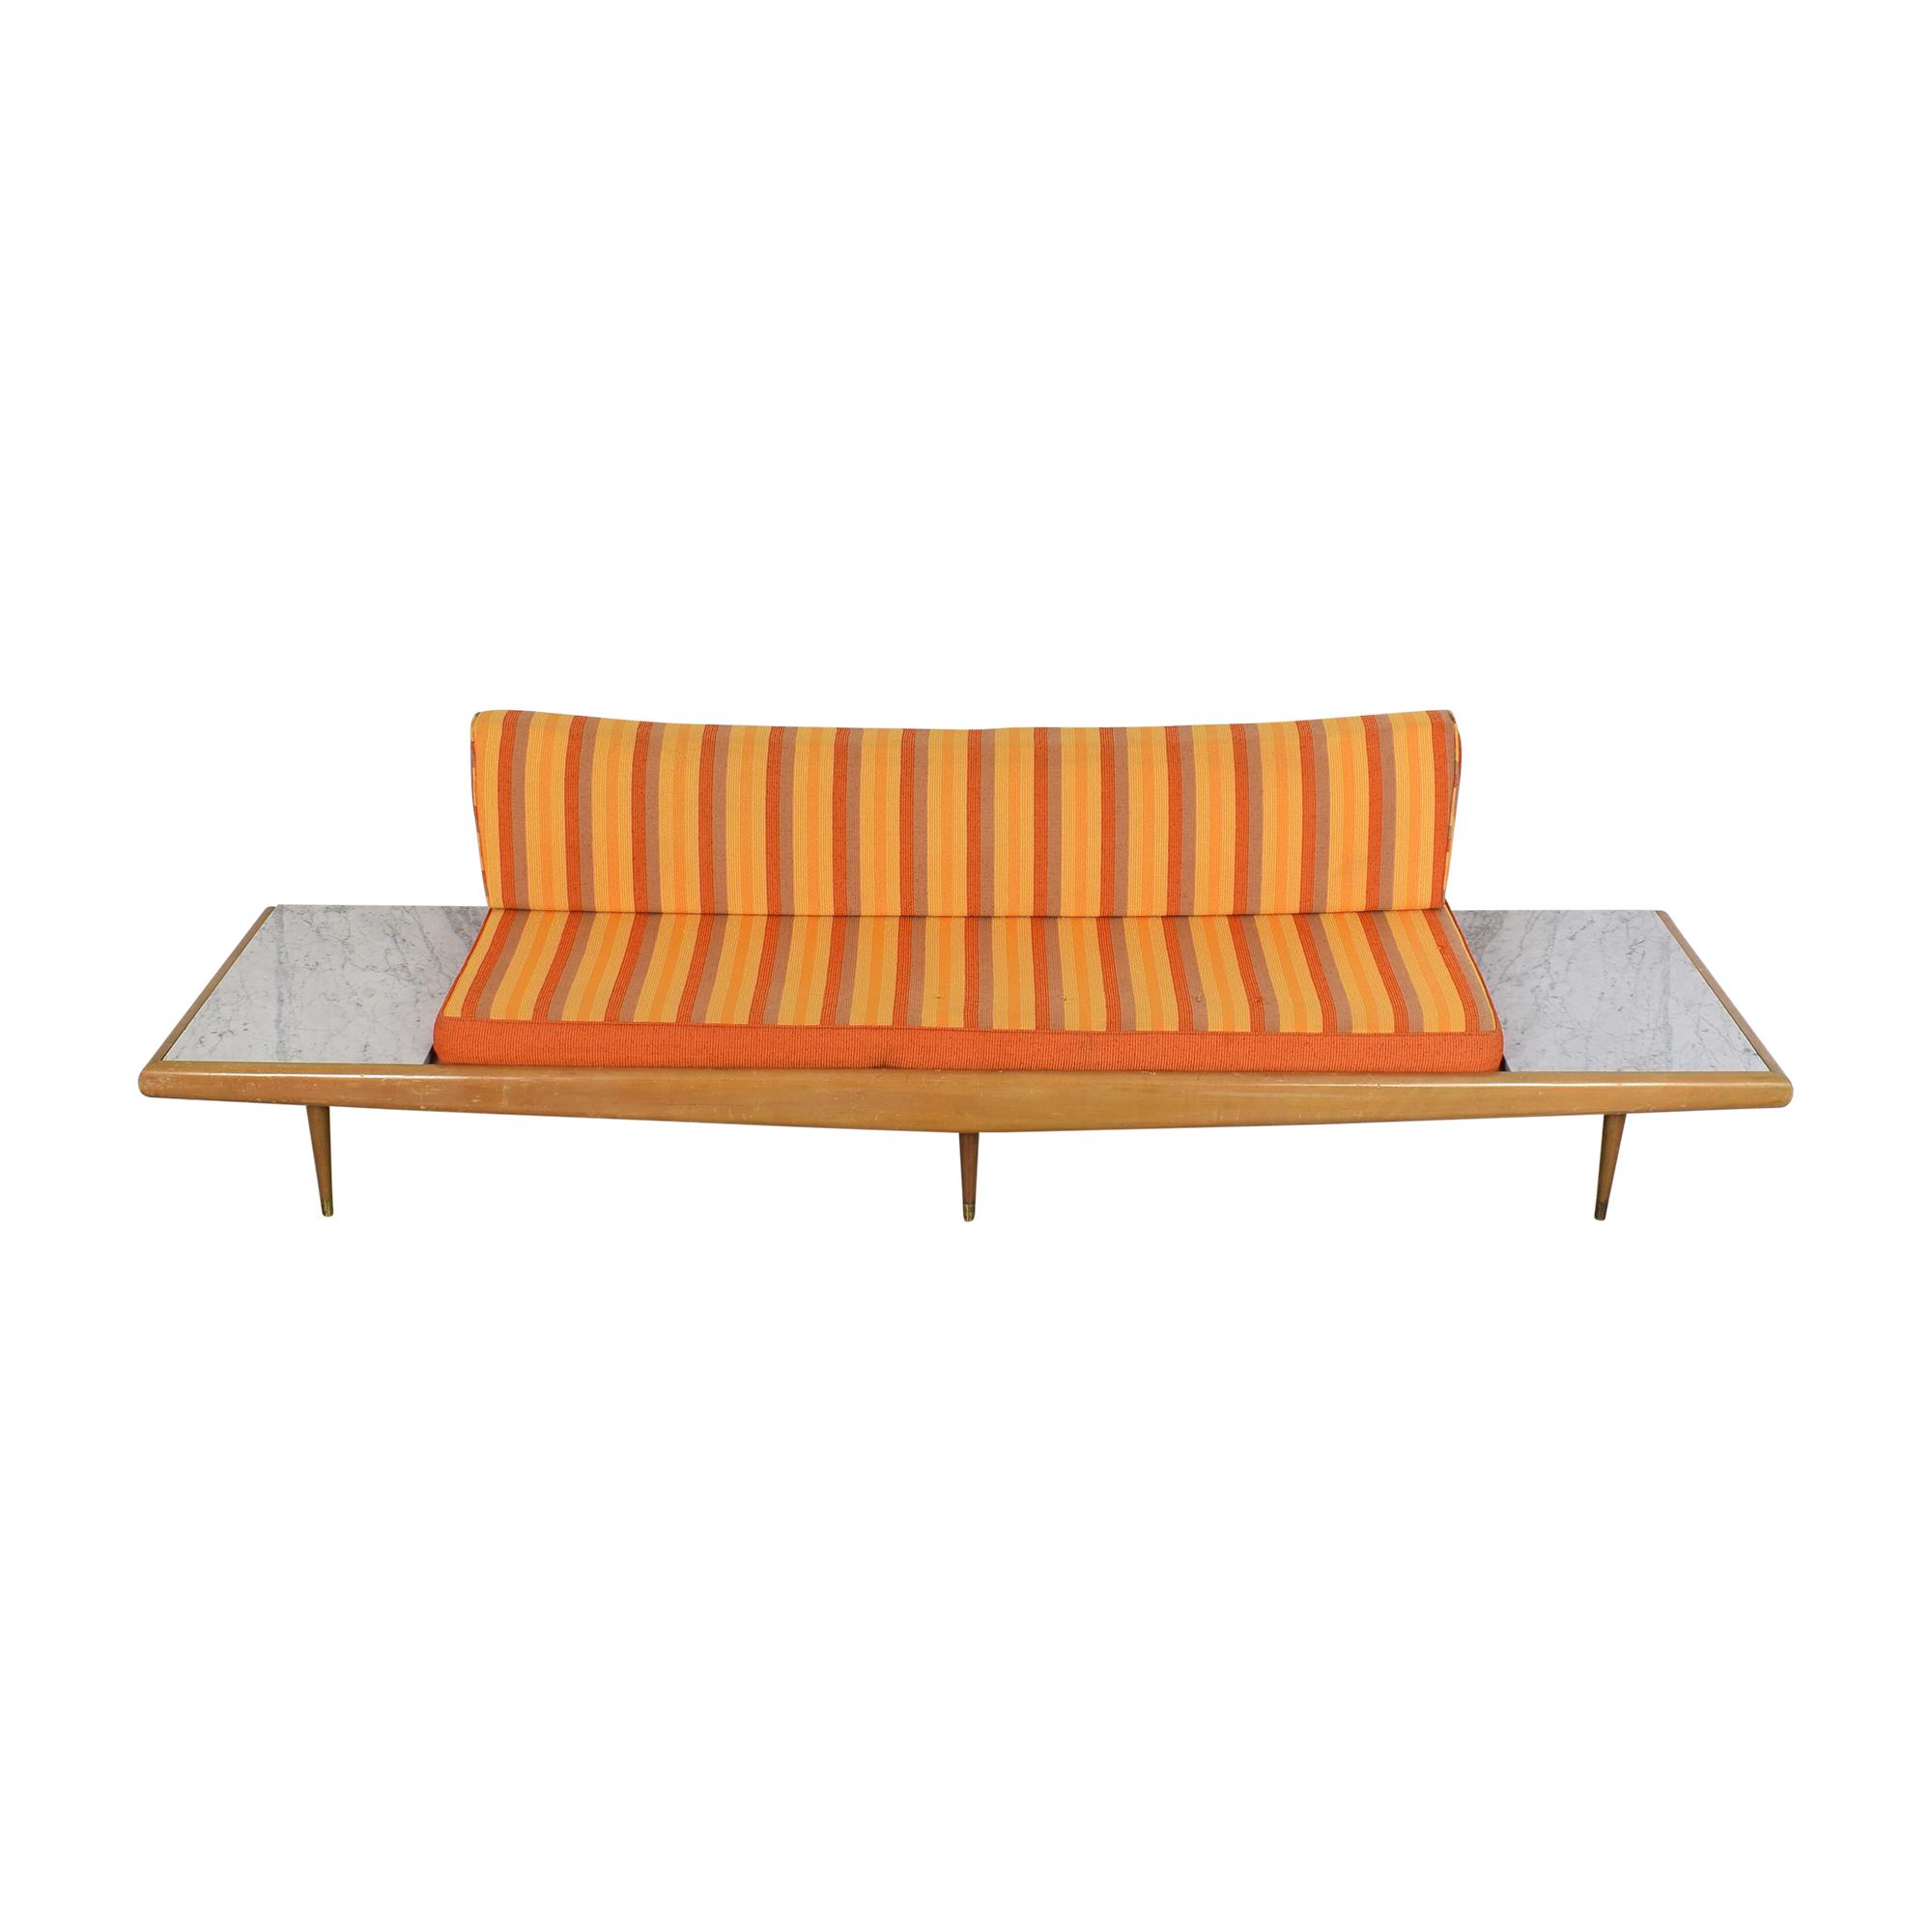 Craft Associates Craft Associates Adrian Pearsall Mid Century Sofa ct